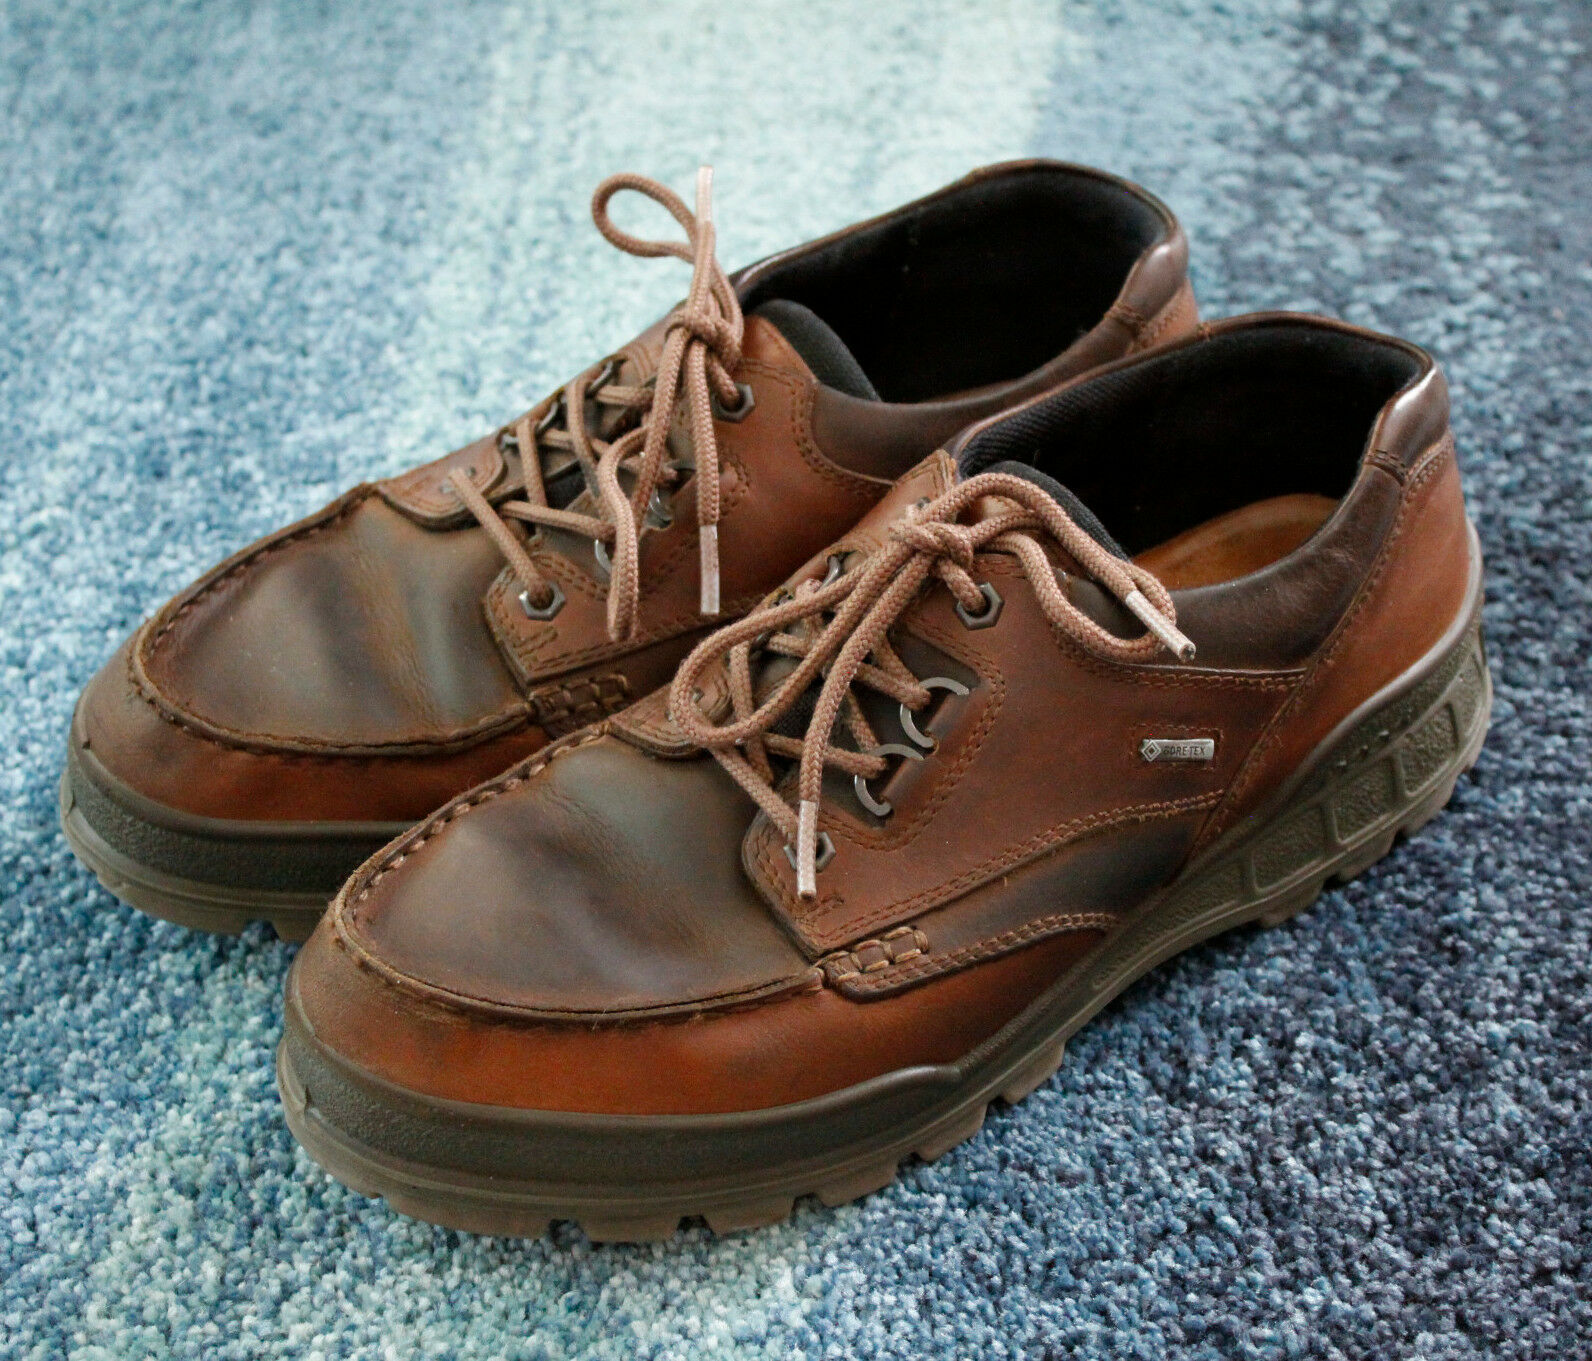 ECCO Track II Low Men's Leather Hiking Shoes Sz 10.5 Gore-Tex Waterproof Brown